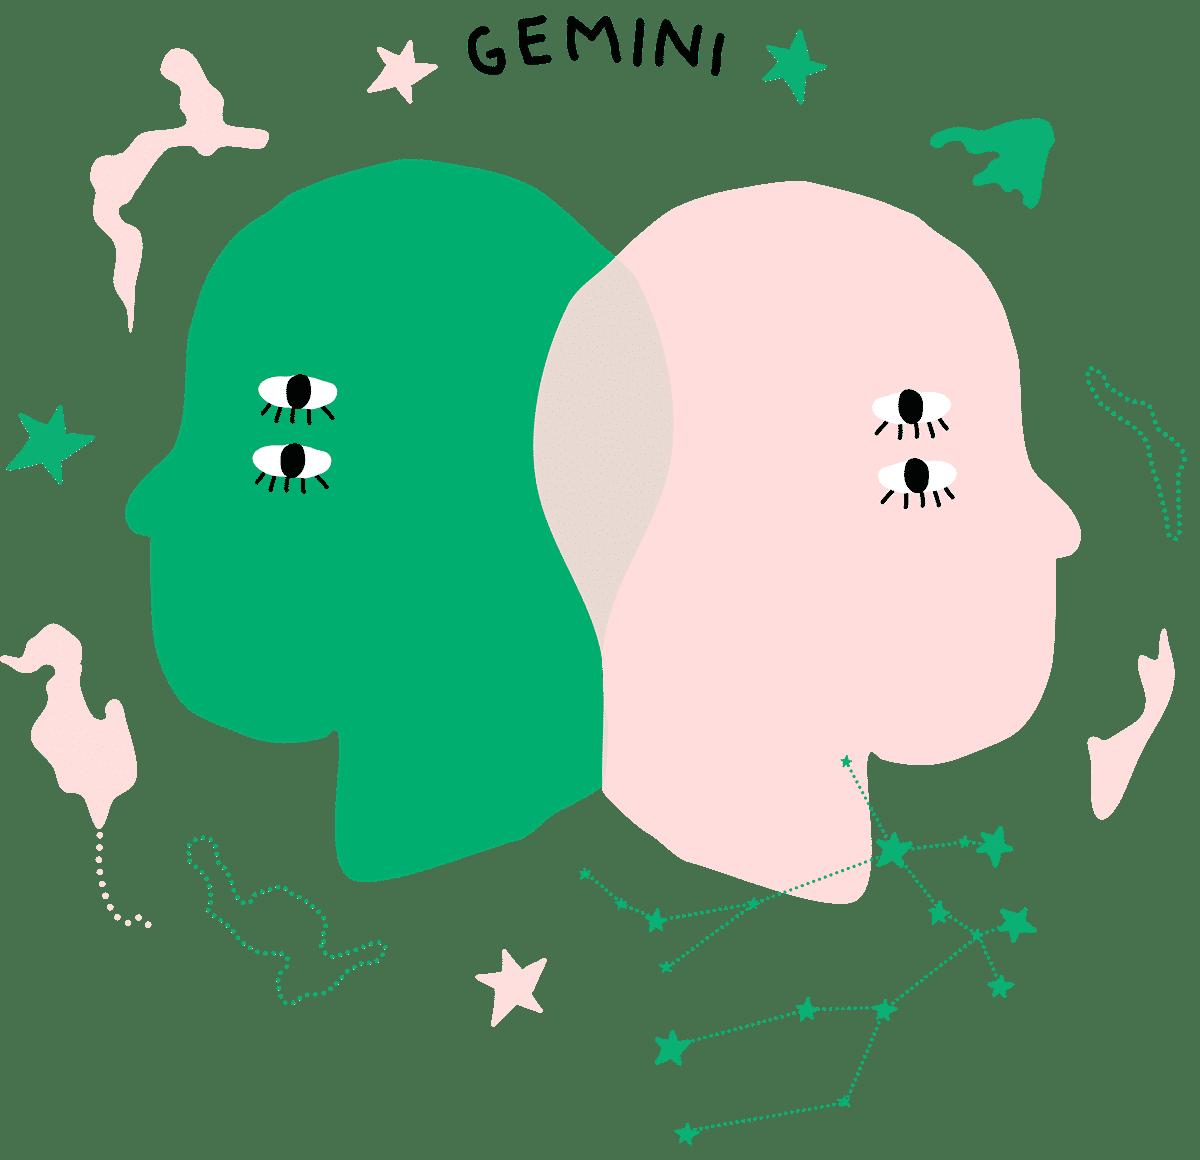 Signed Advice: Gemini by Meech Boakye